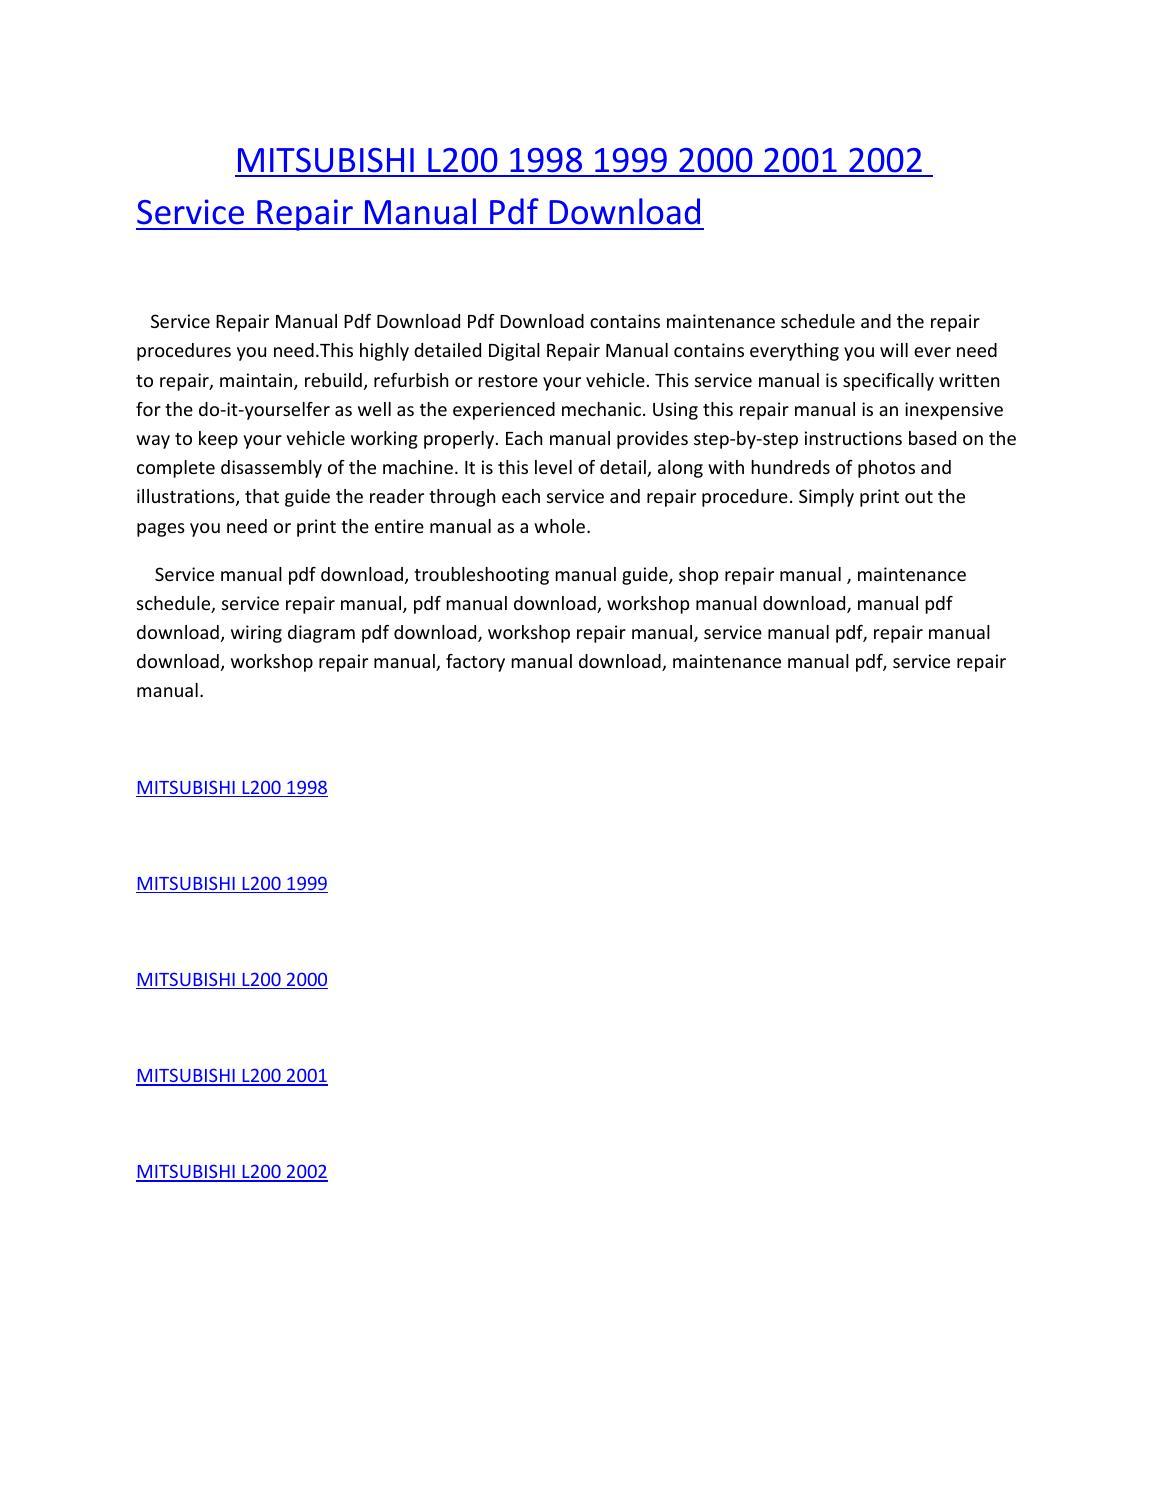 hight resolution of mitsubishi l200 1998 1999 2000 2001 2002 service repair manual pdf download by amurgului issuu